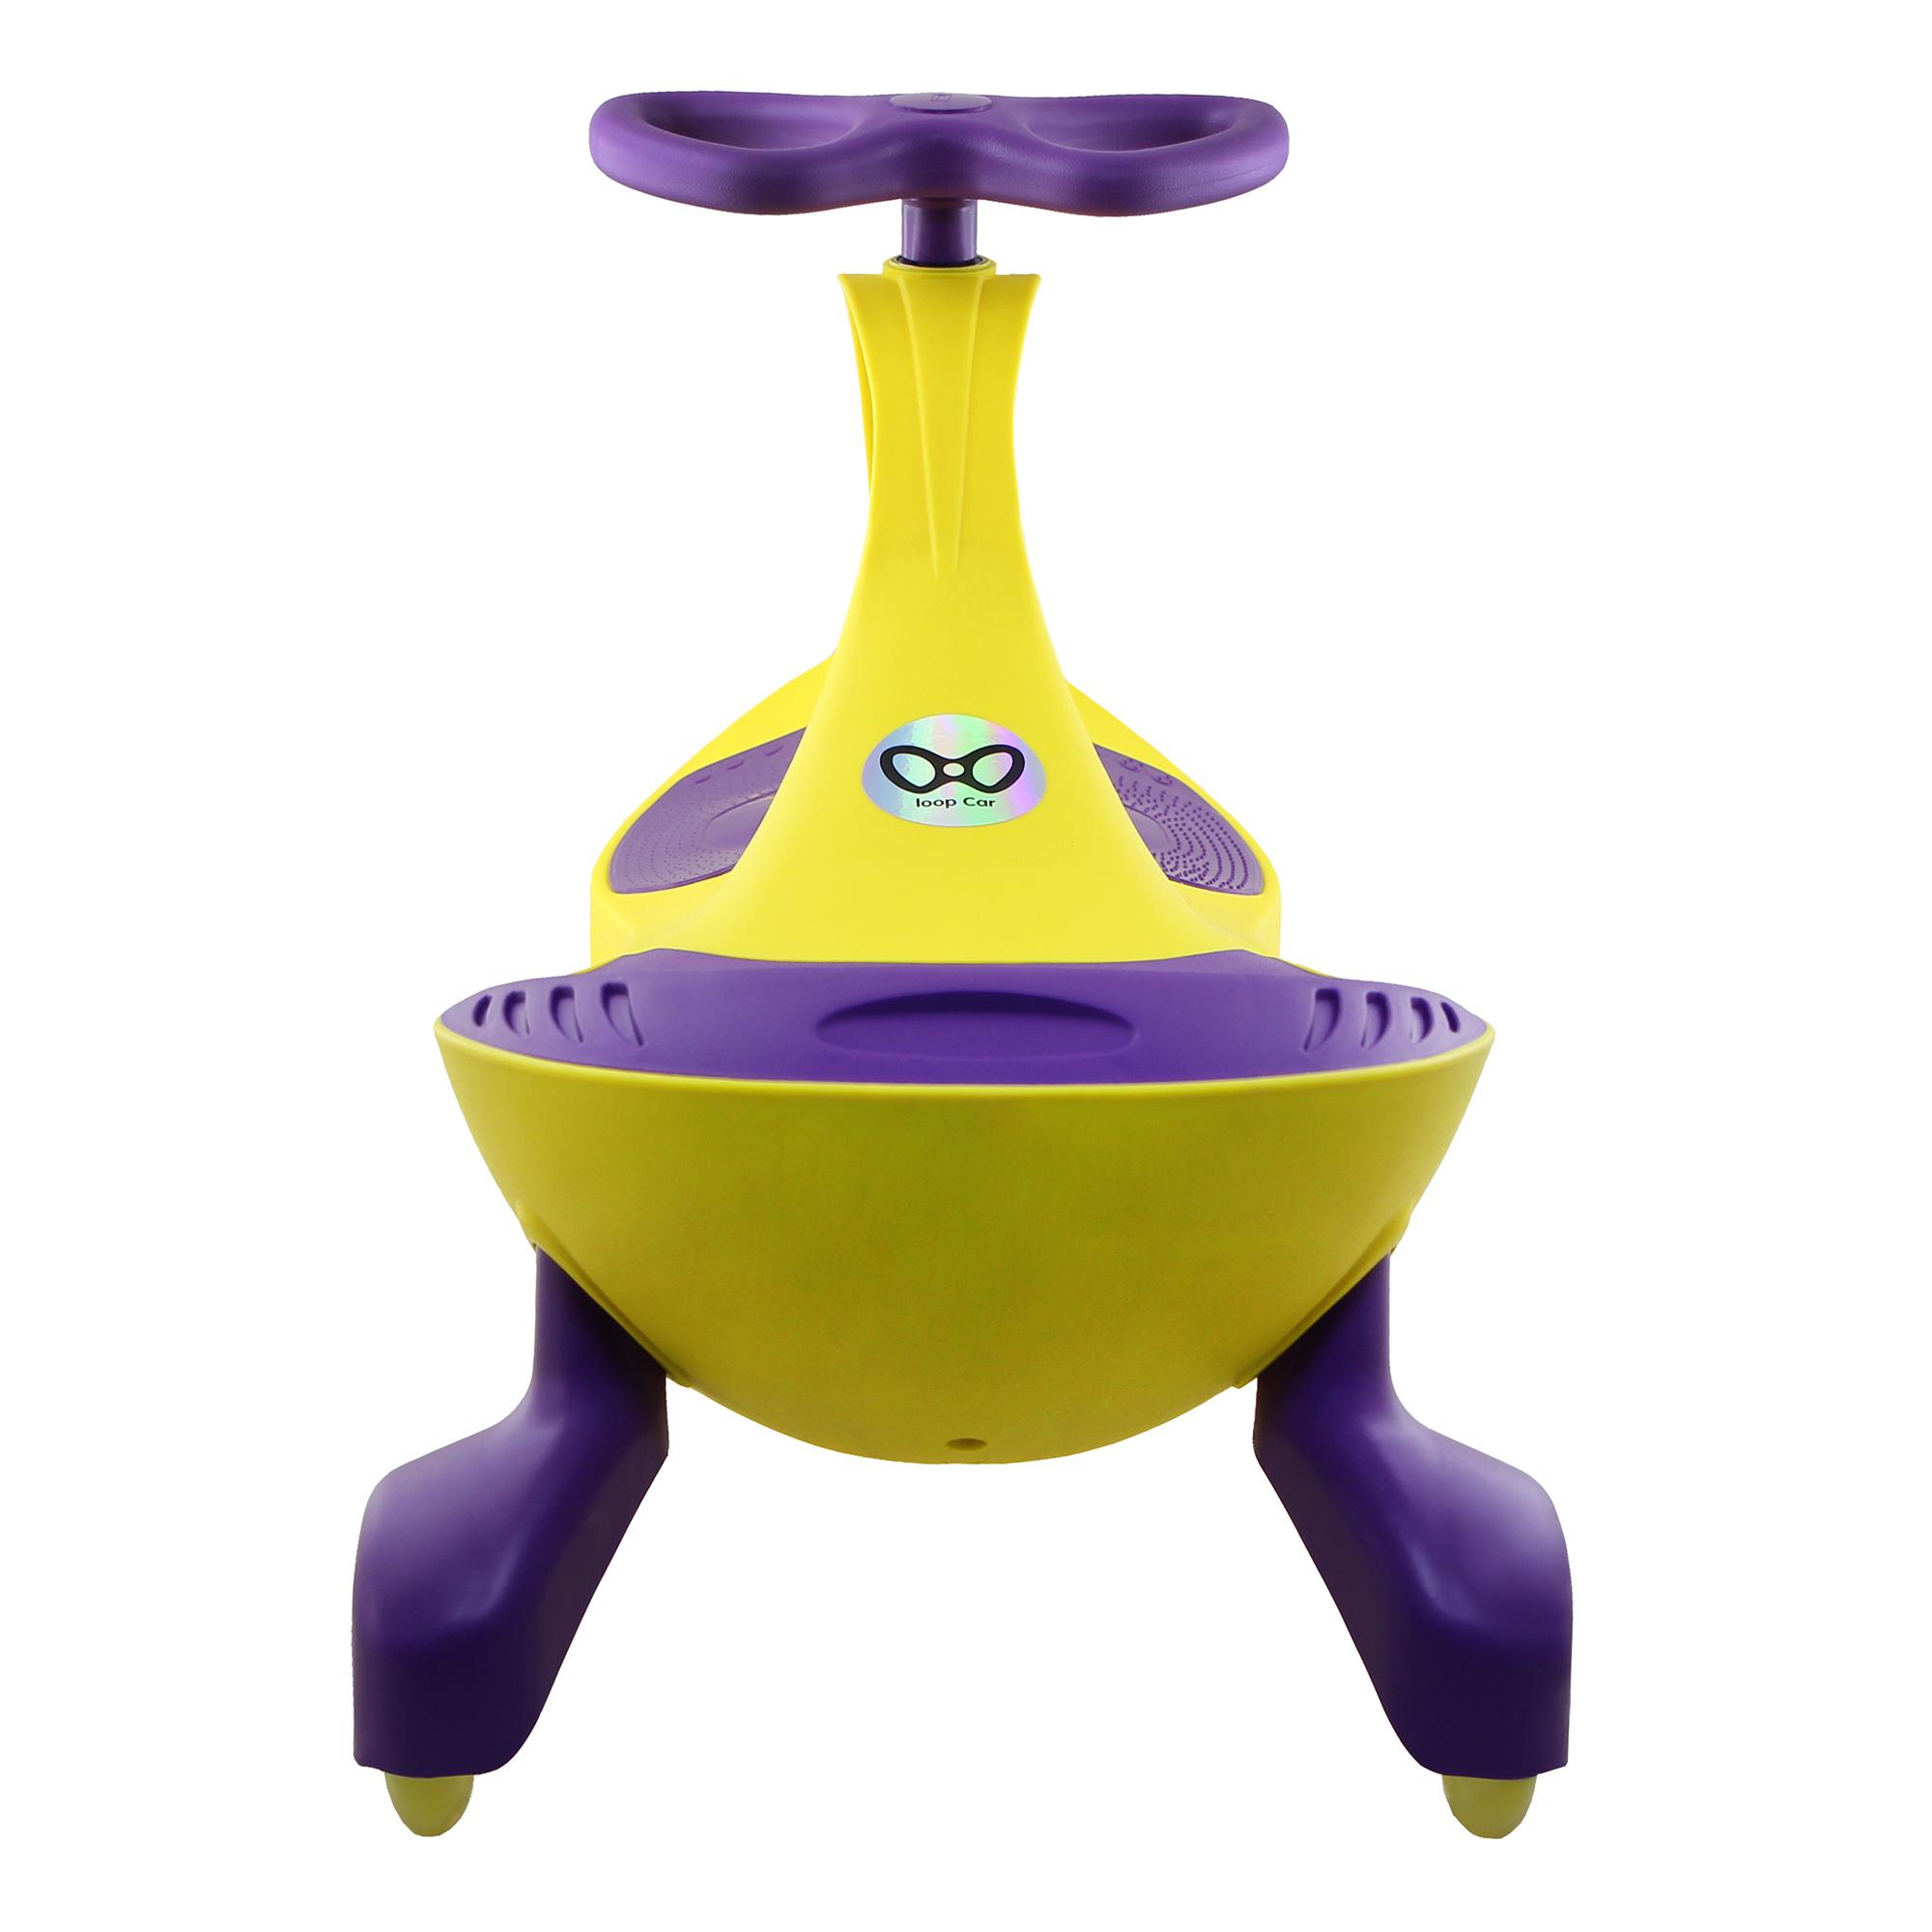 Loopcar Yellow Purple 04